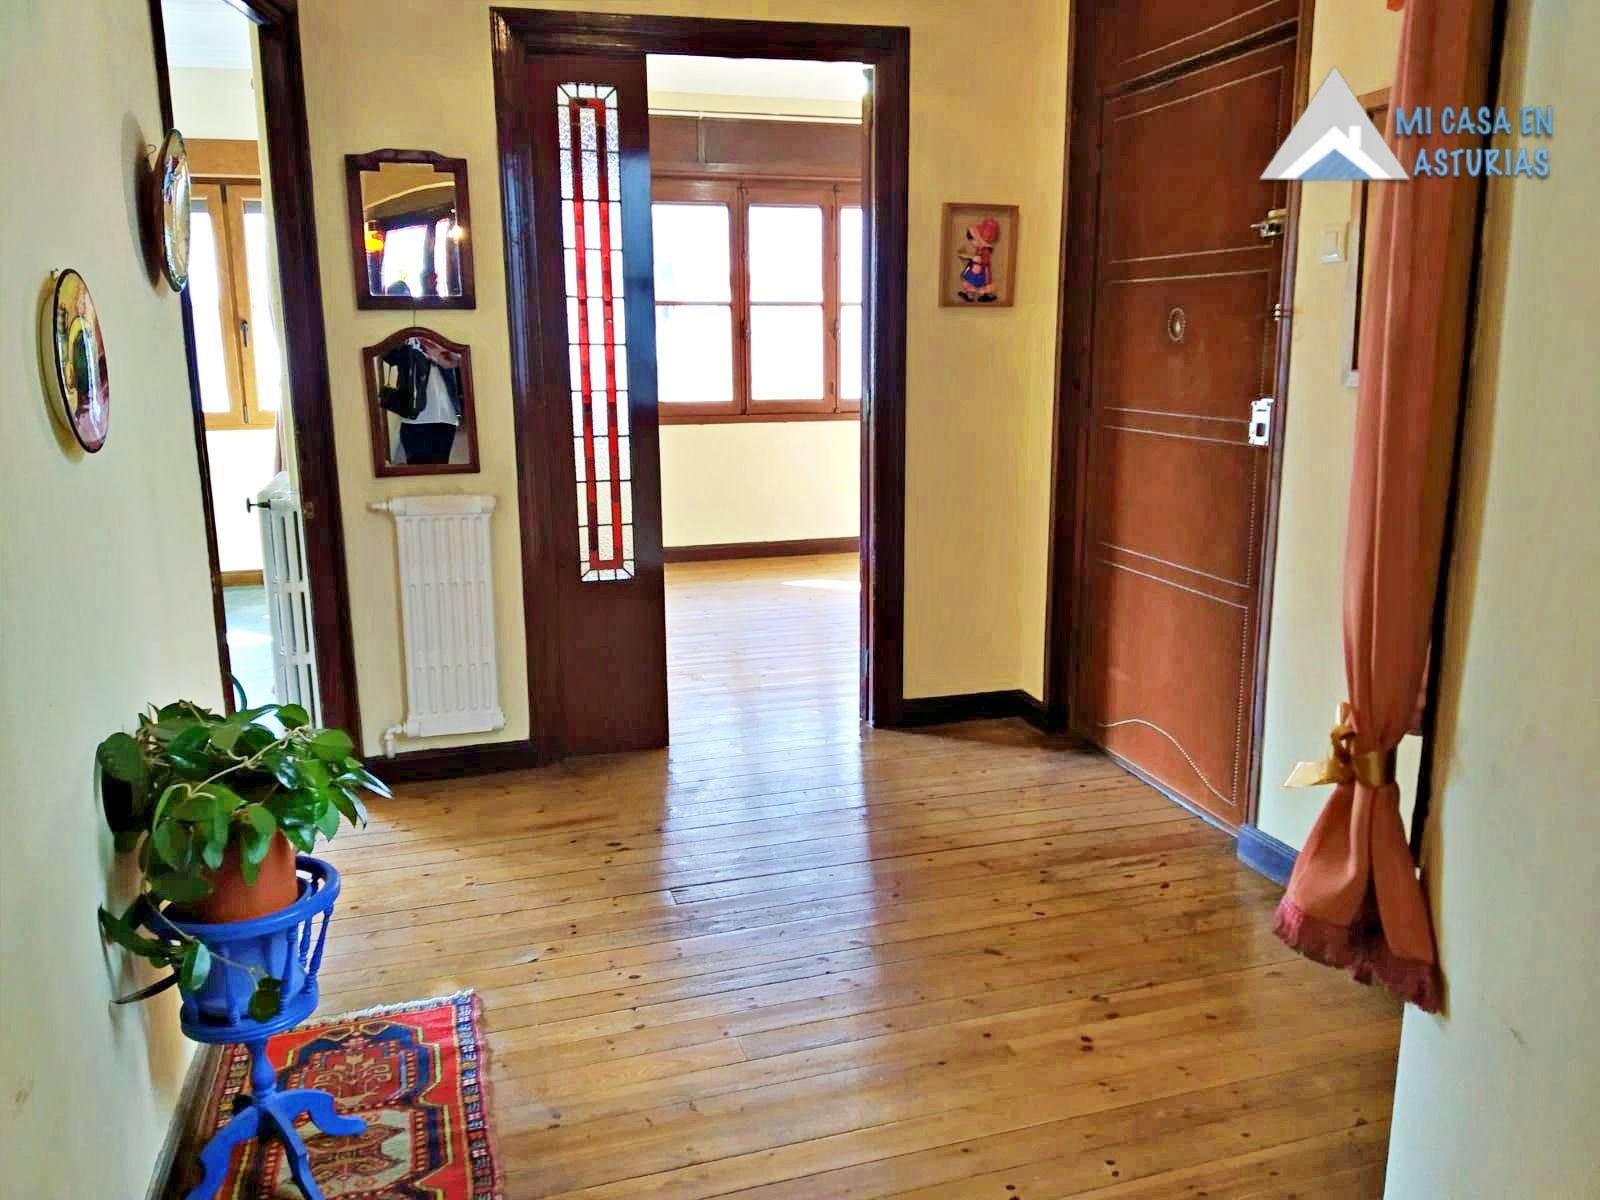 Alquiler de piso en Calle Uría, Oviedo.